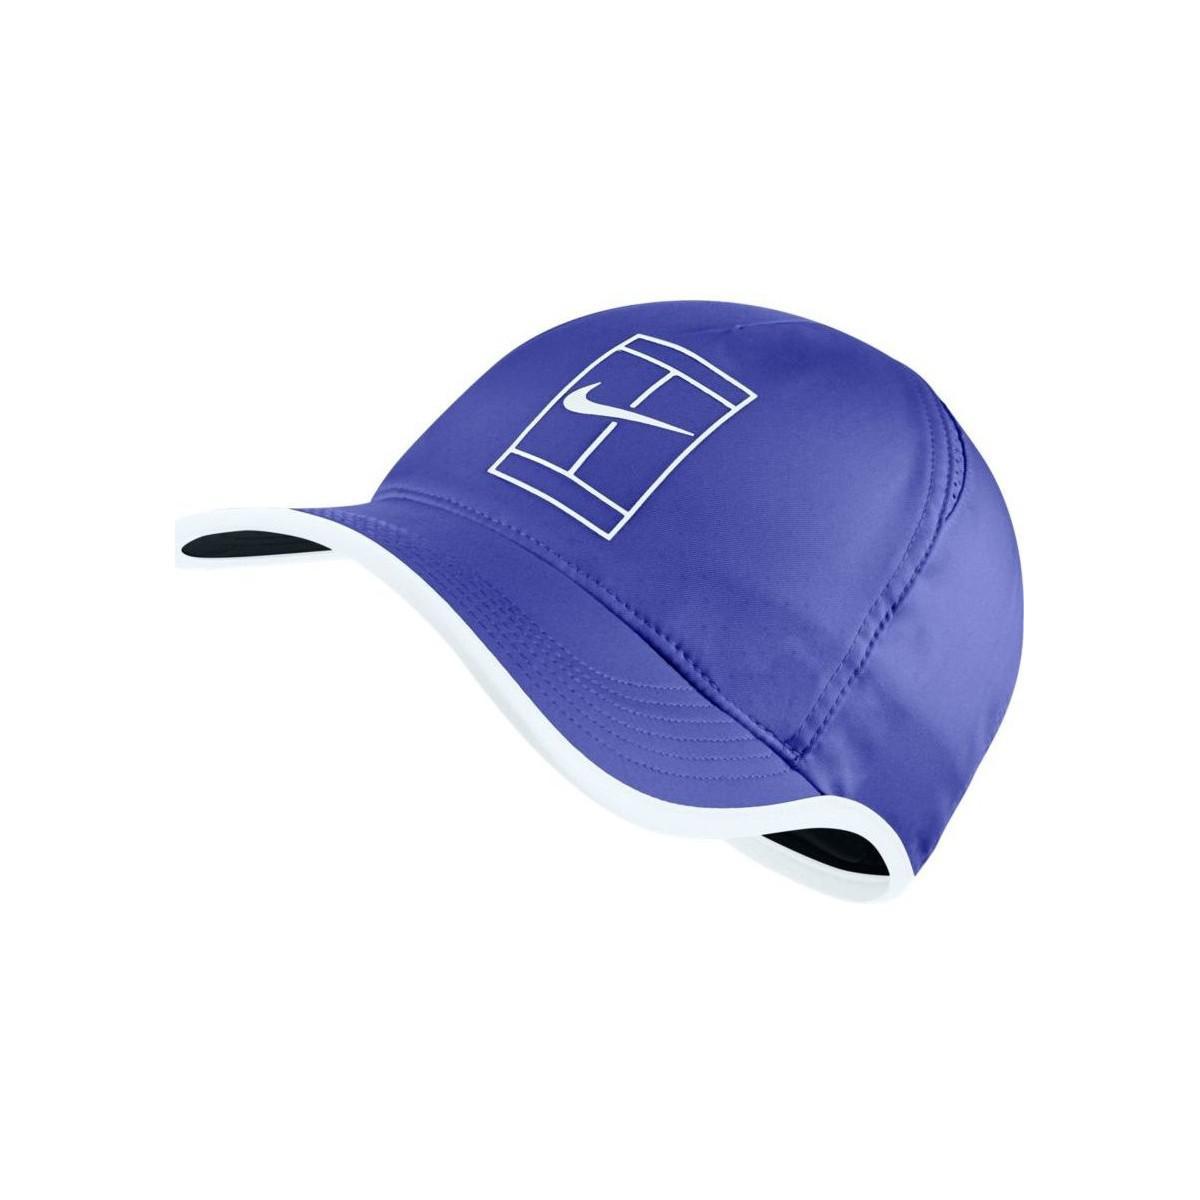 b6fa12615 Nike Court Aerobill Featherlight Tennis Cap Men's Cap In Blue in ...